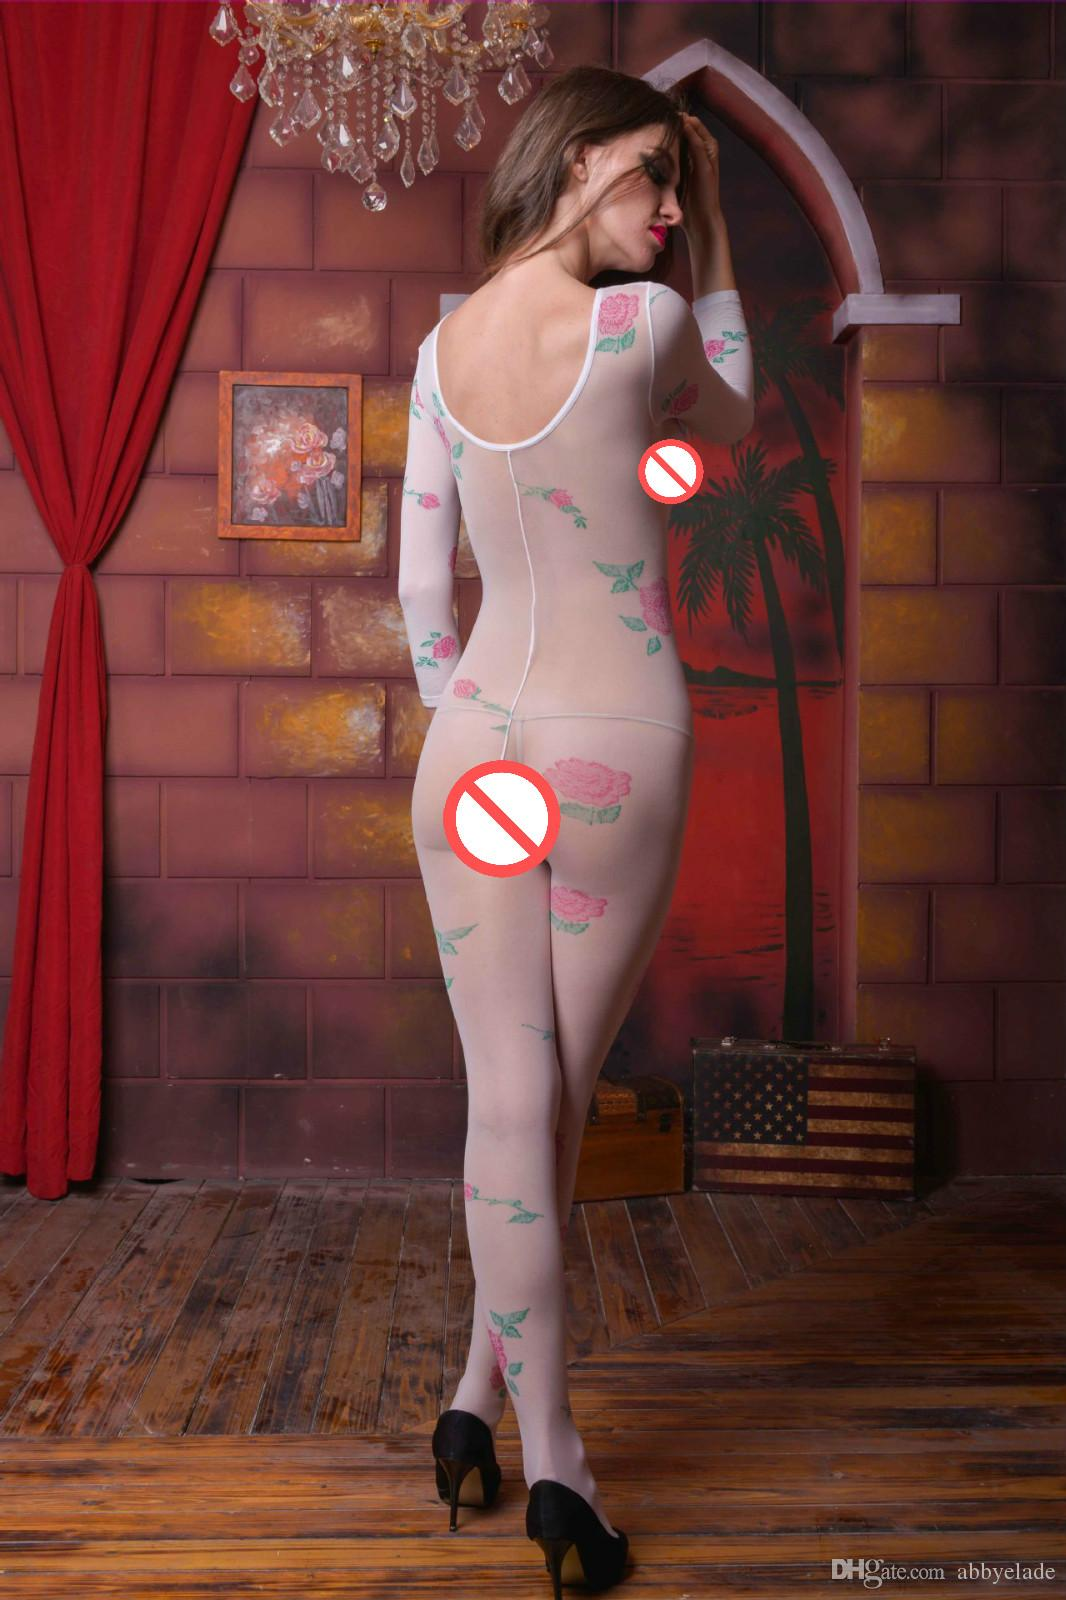 Estilo europeu Mulheres Bodystocking Rose Virilha Aberta Pantyhose Fetiche Bodysuit Feminino pj Sexy Bodysuit Perspectiva corpo Lingerie Sexy Underwear